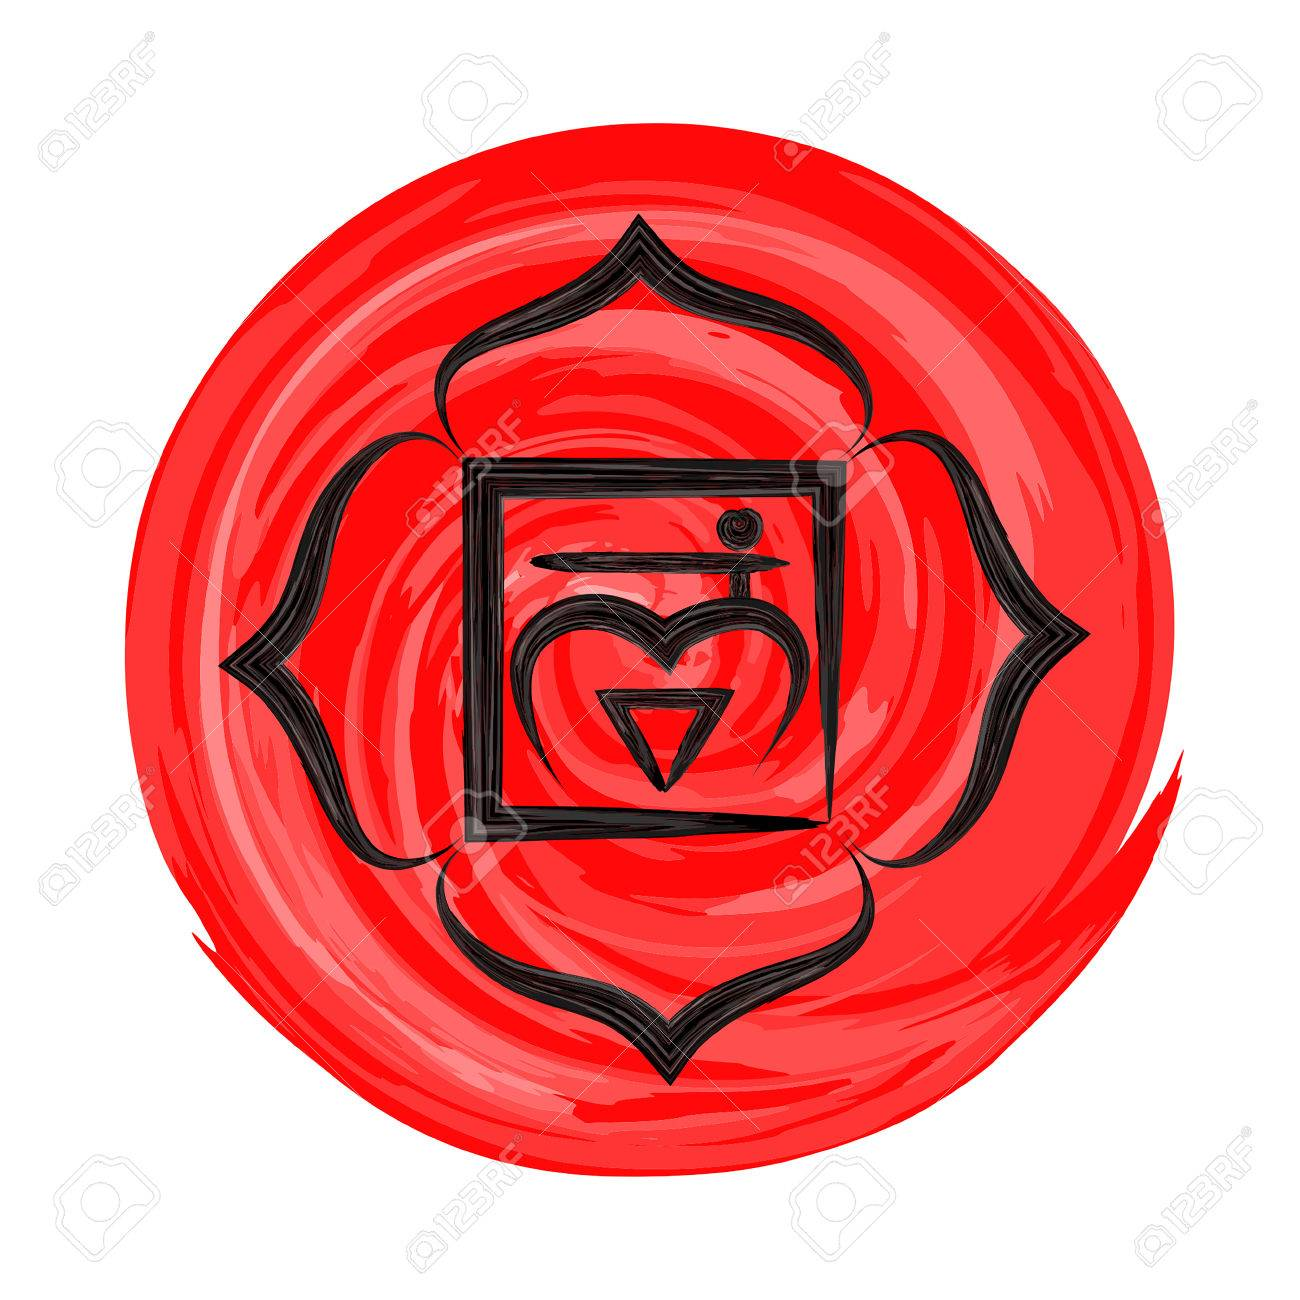 Muladhara chakra vector illustration - 68671587